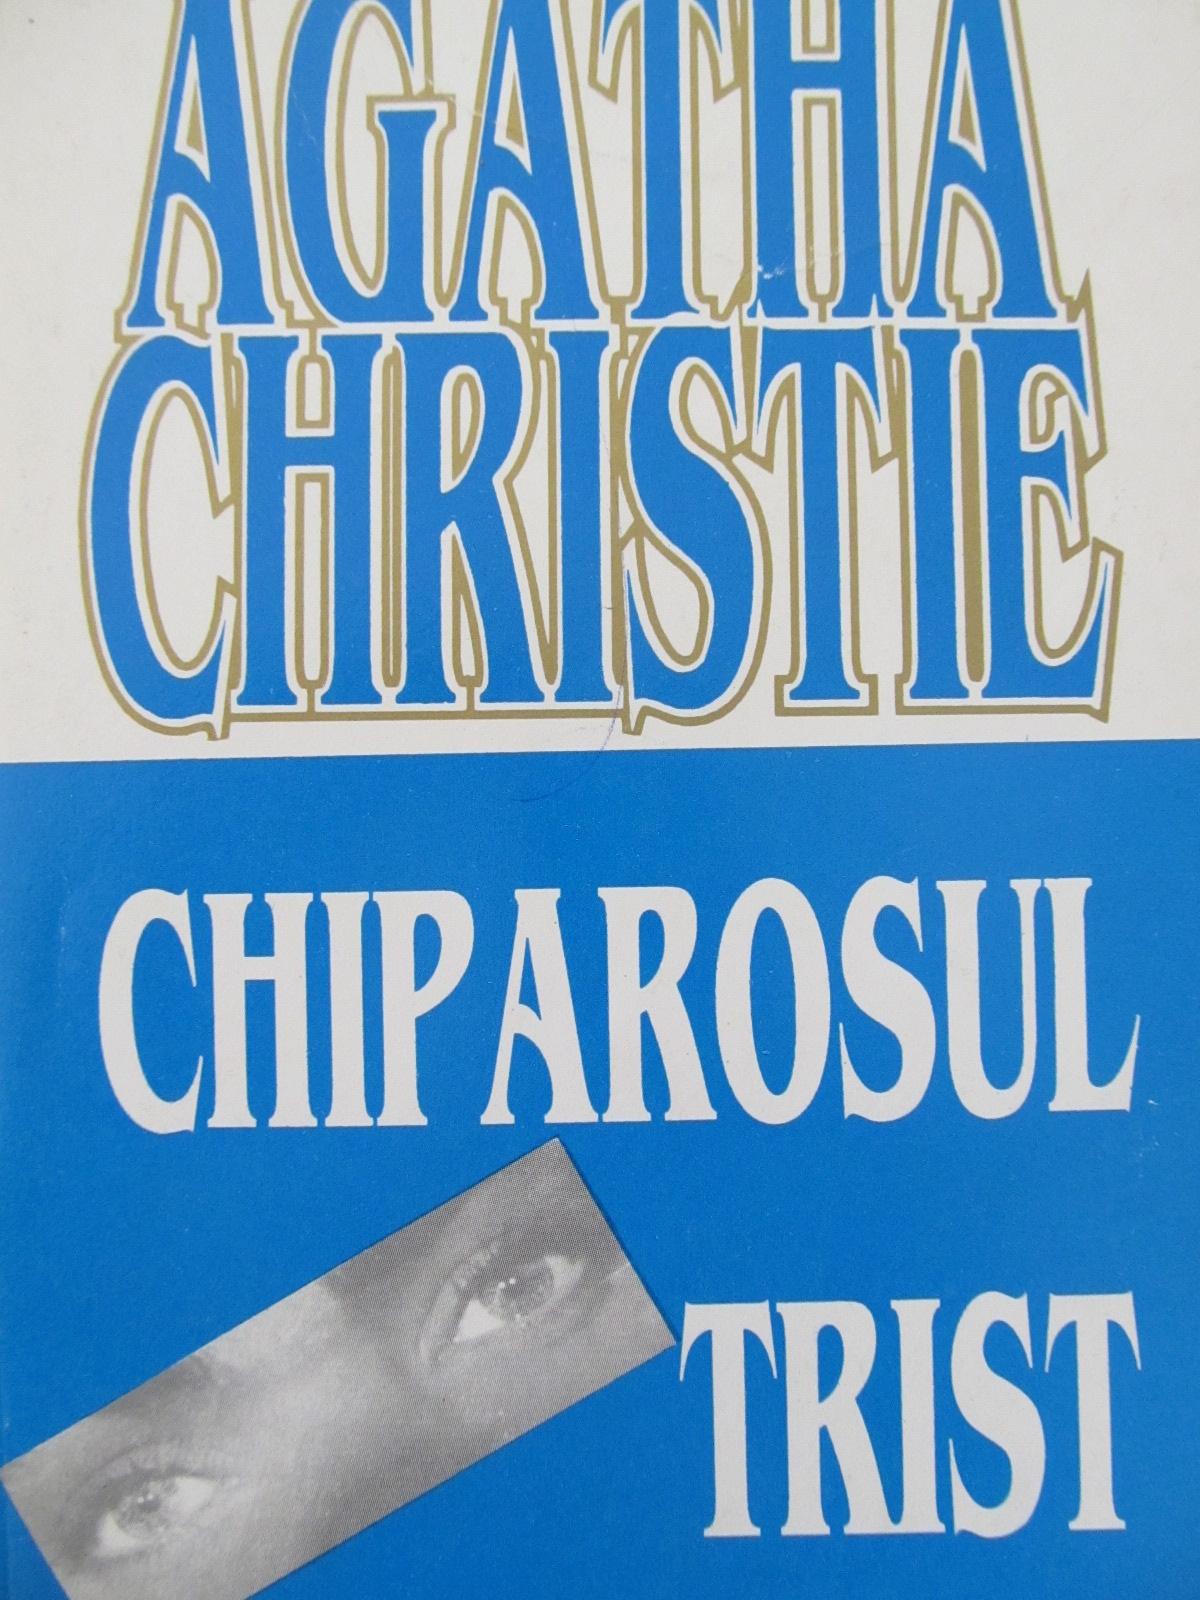 Chiparosul trist [1] - Agatha Christie | Detalii carte